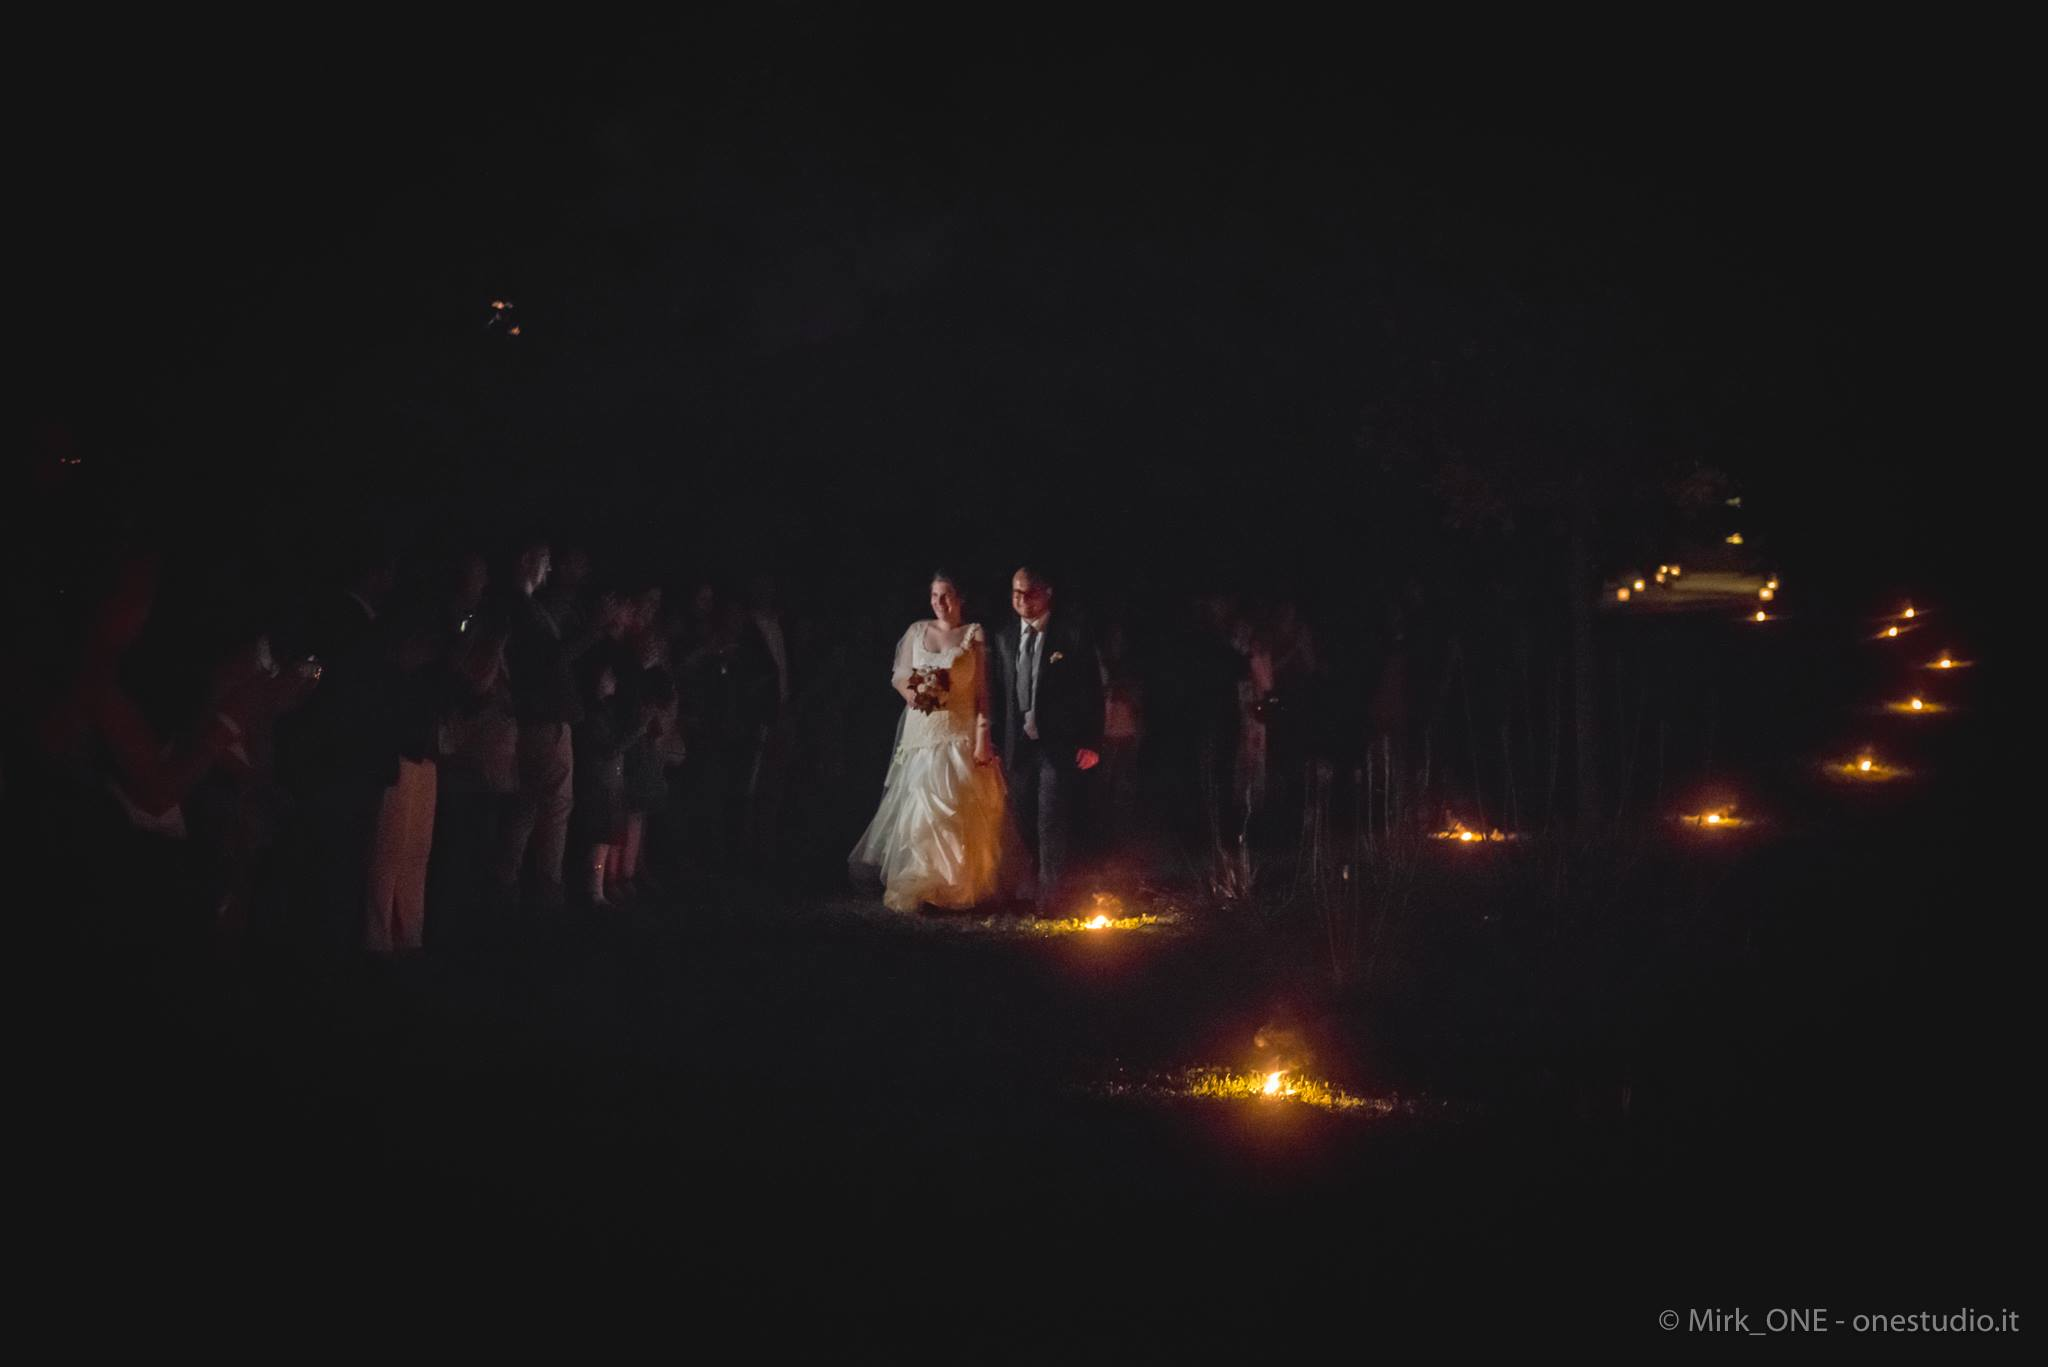 https://lnx.mirkone.it/wp-content/uploads/2018/03/mirk_ONE-fotografo-matrimonio-00844.jpg